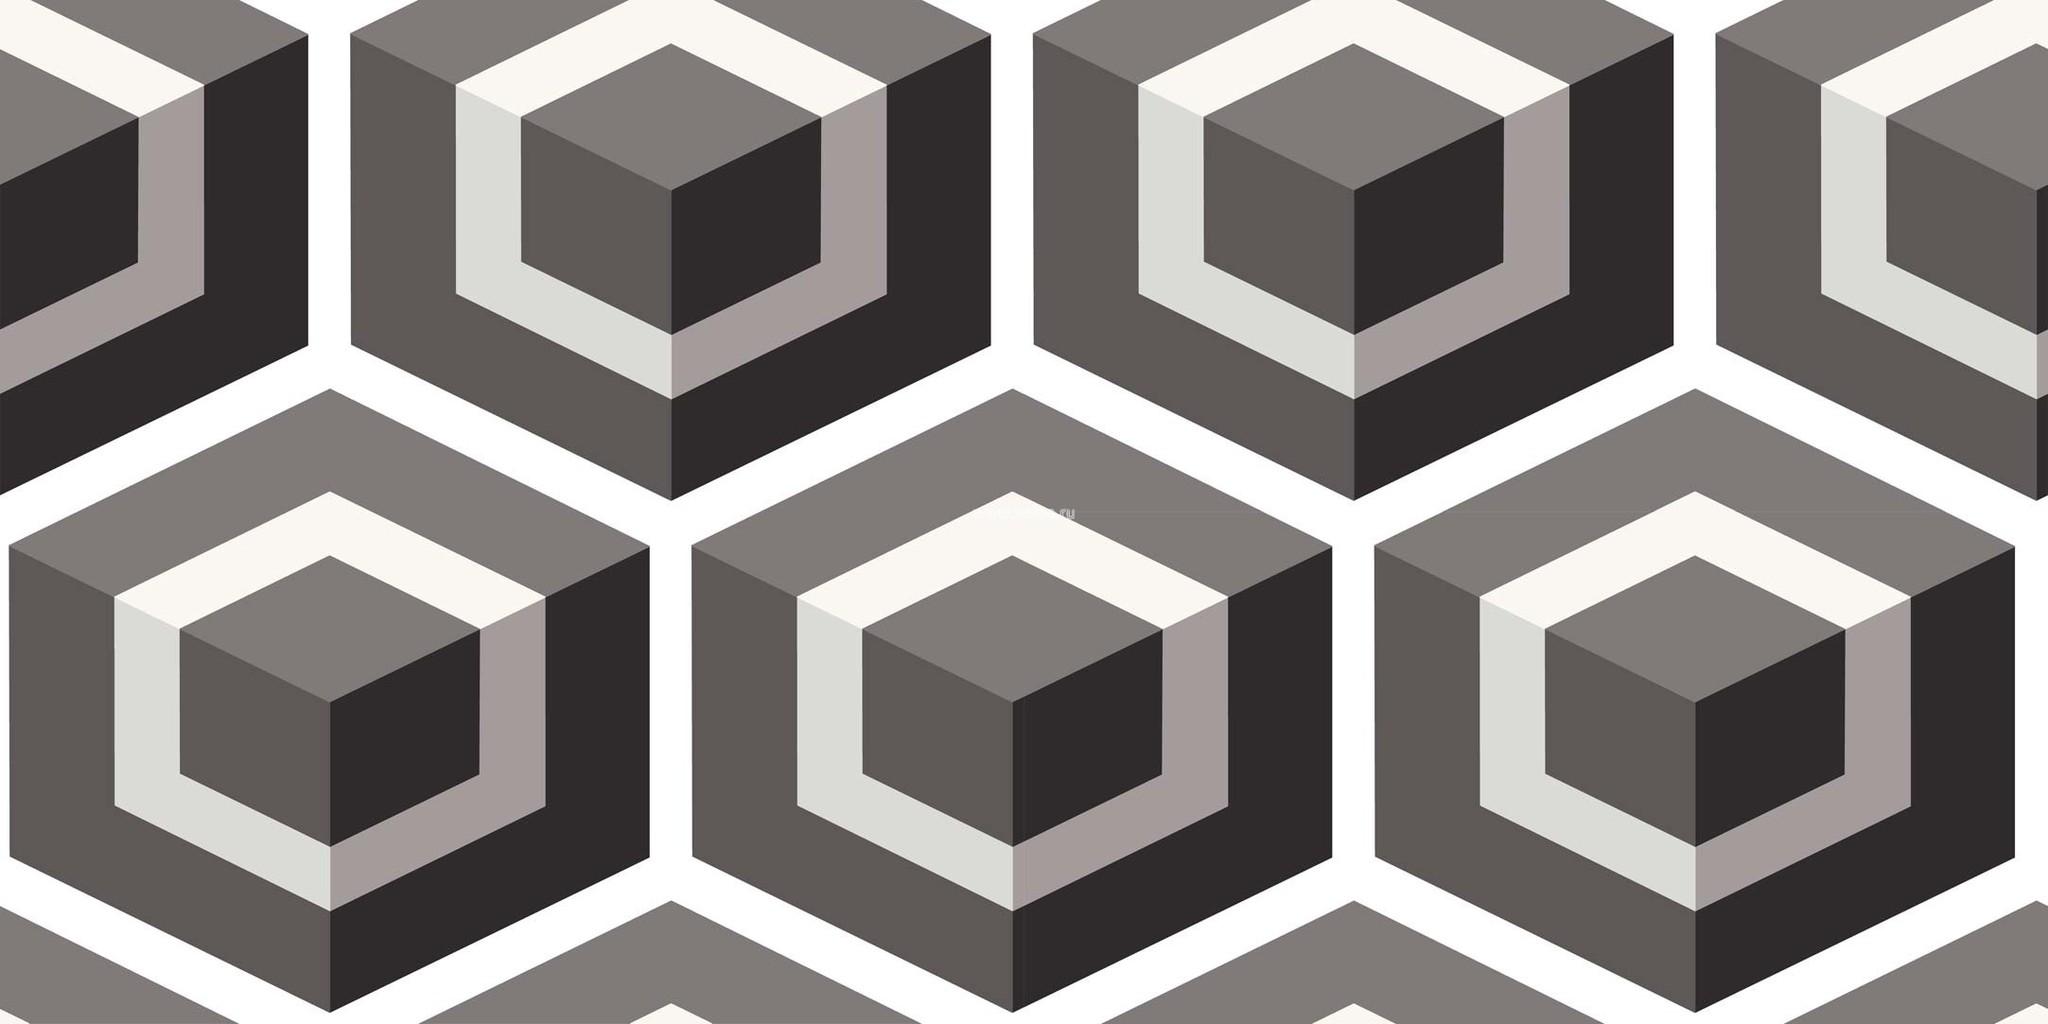 Обои Cole & Son Geometric 93/1002, интернет магазин Волео